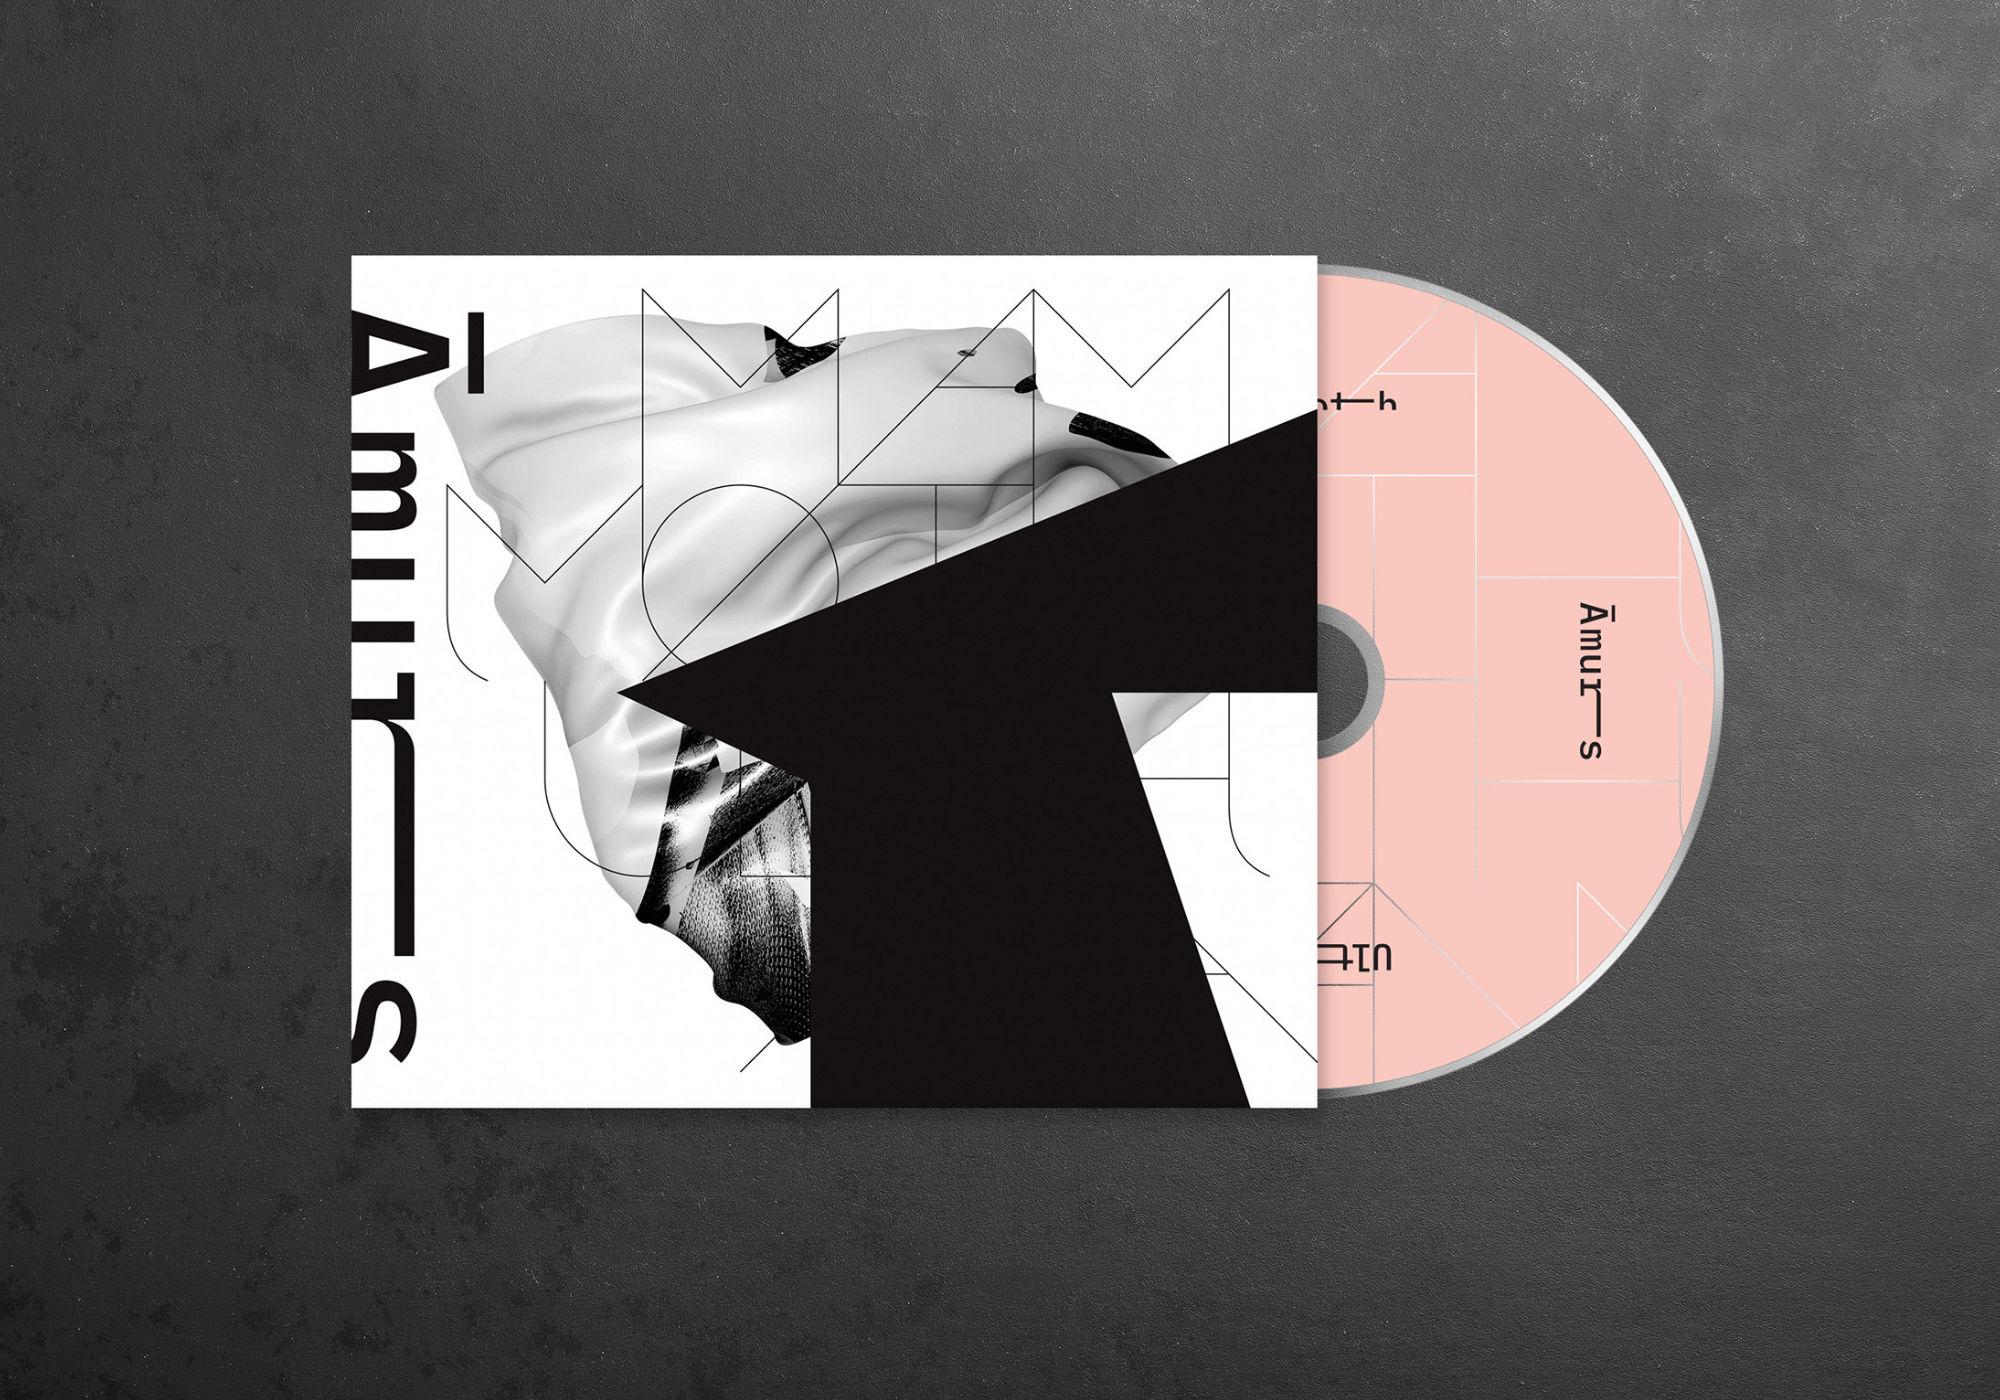 Jacek Doroszenko - Amurs, contemporary music, album 01